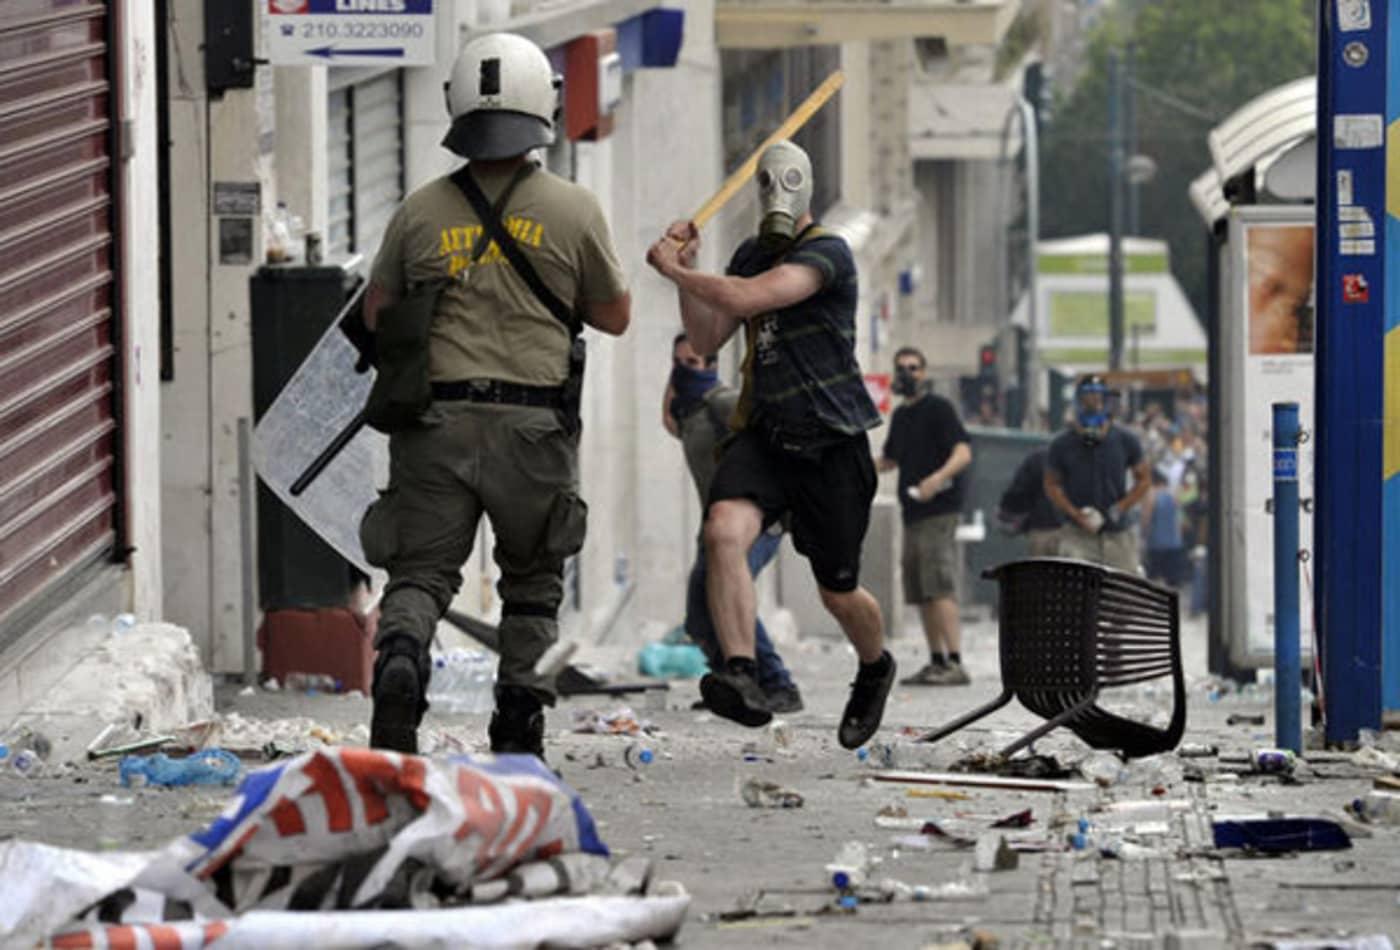 CNBC_Major_Events_Eurozone_Greek_Protest.jpg